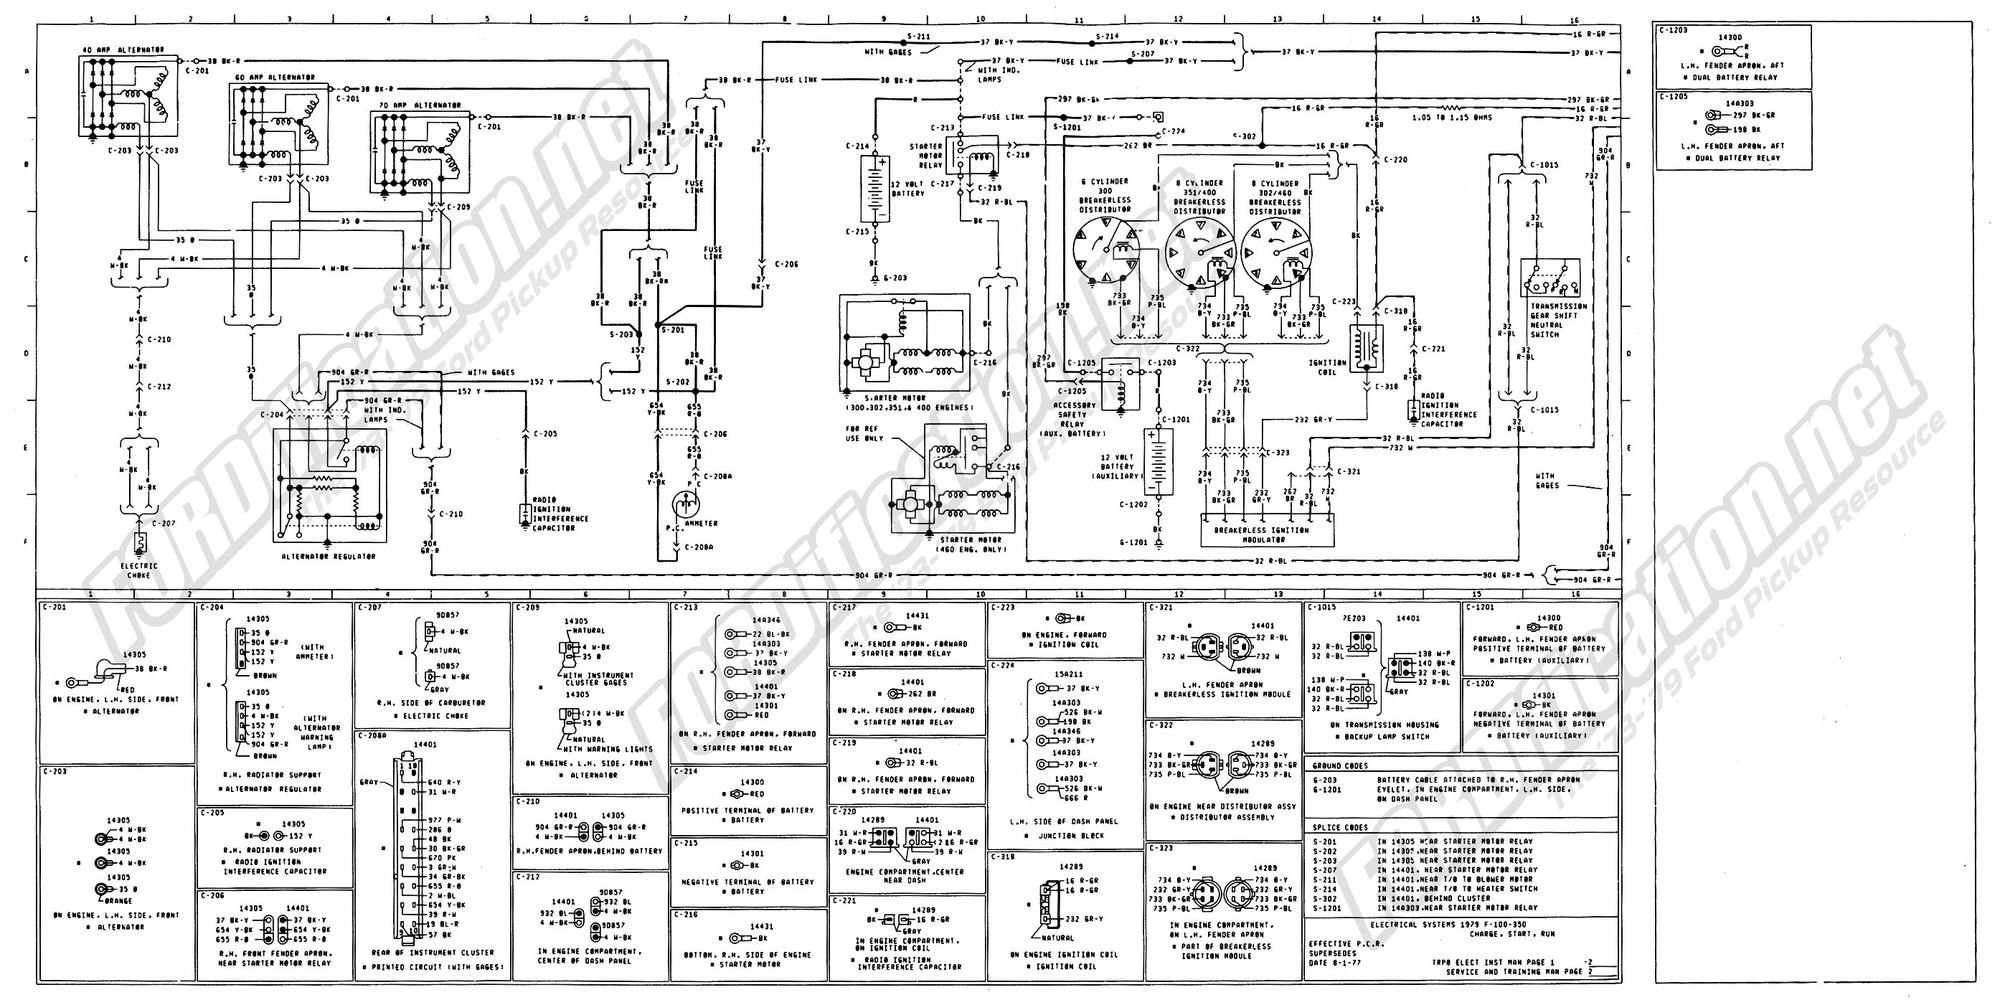 Diagram Of International Truck